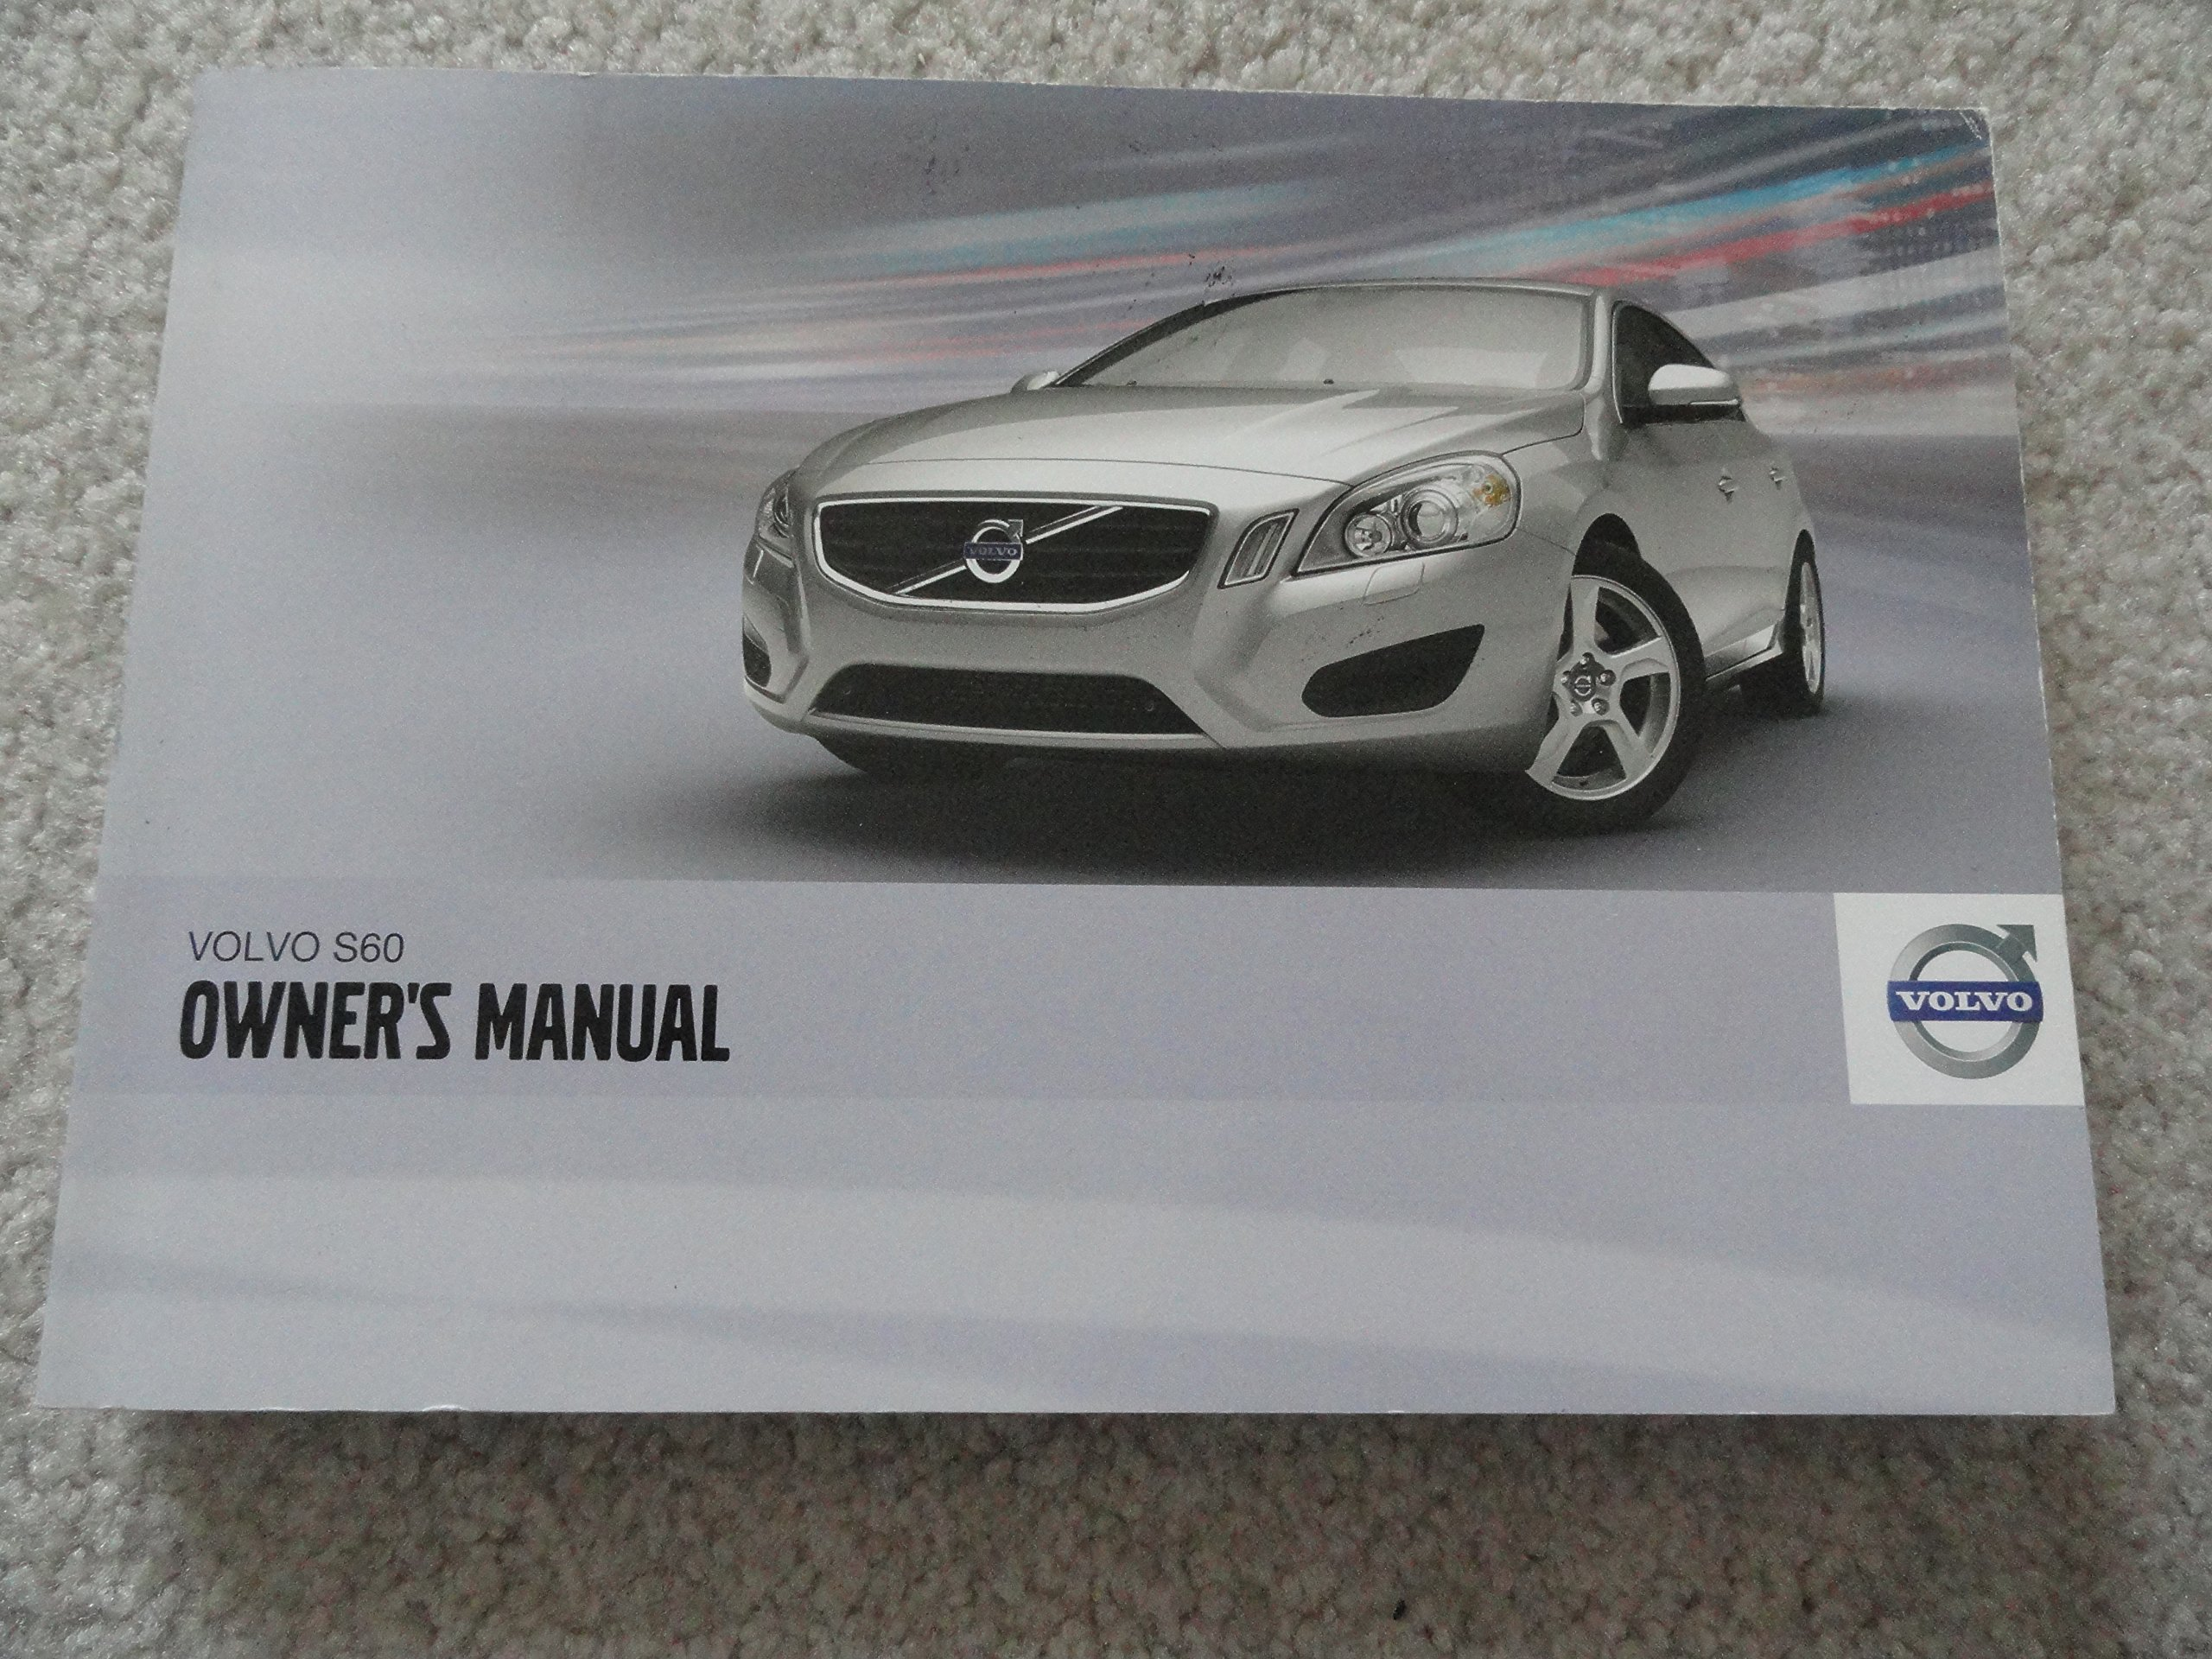 2012 volvo s60 owners manual amazon com books rh amazon com Volvo V60 Volvo S60